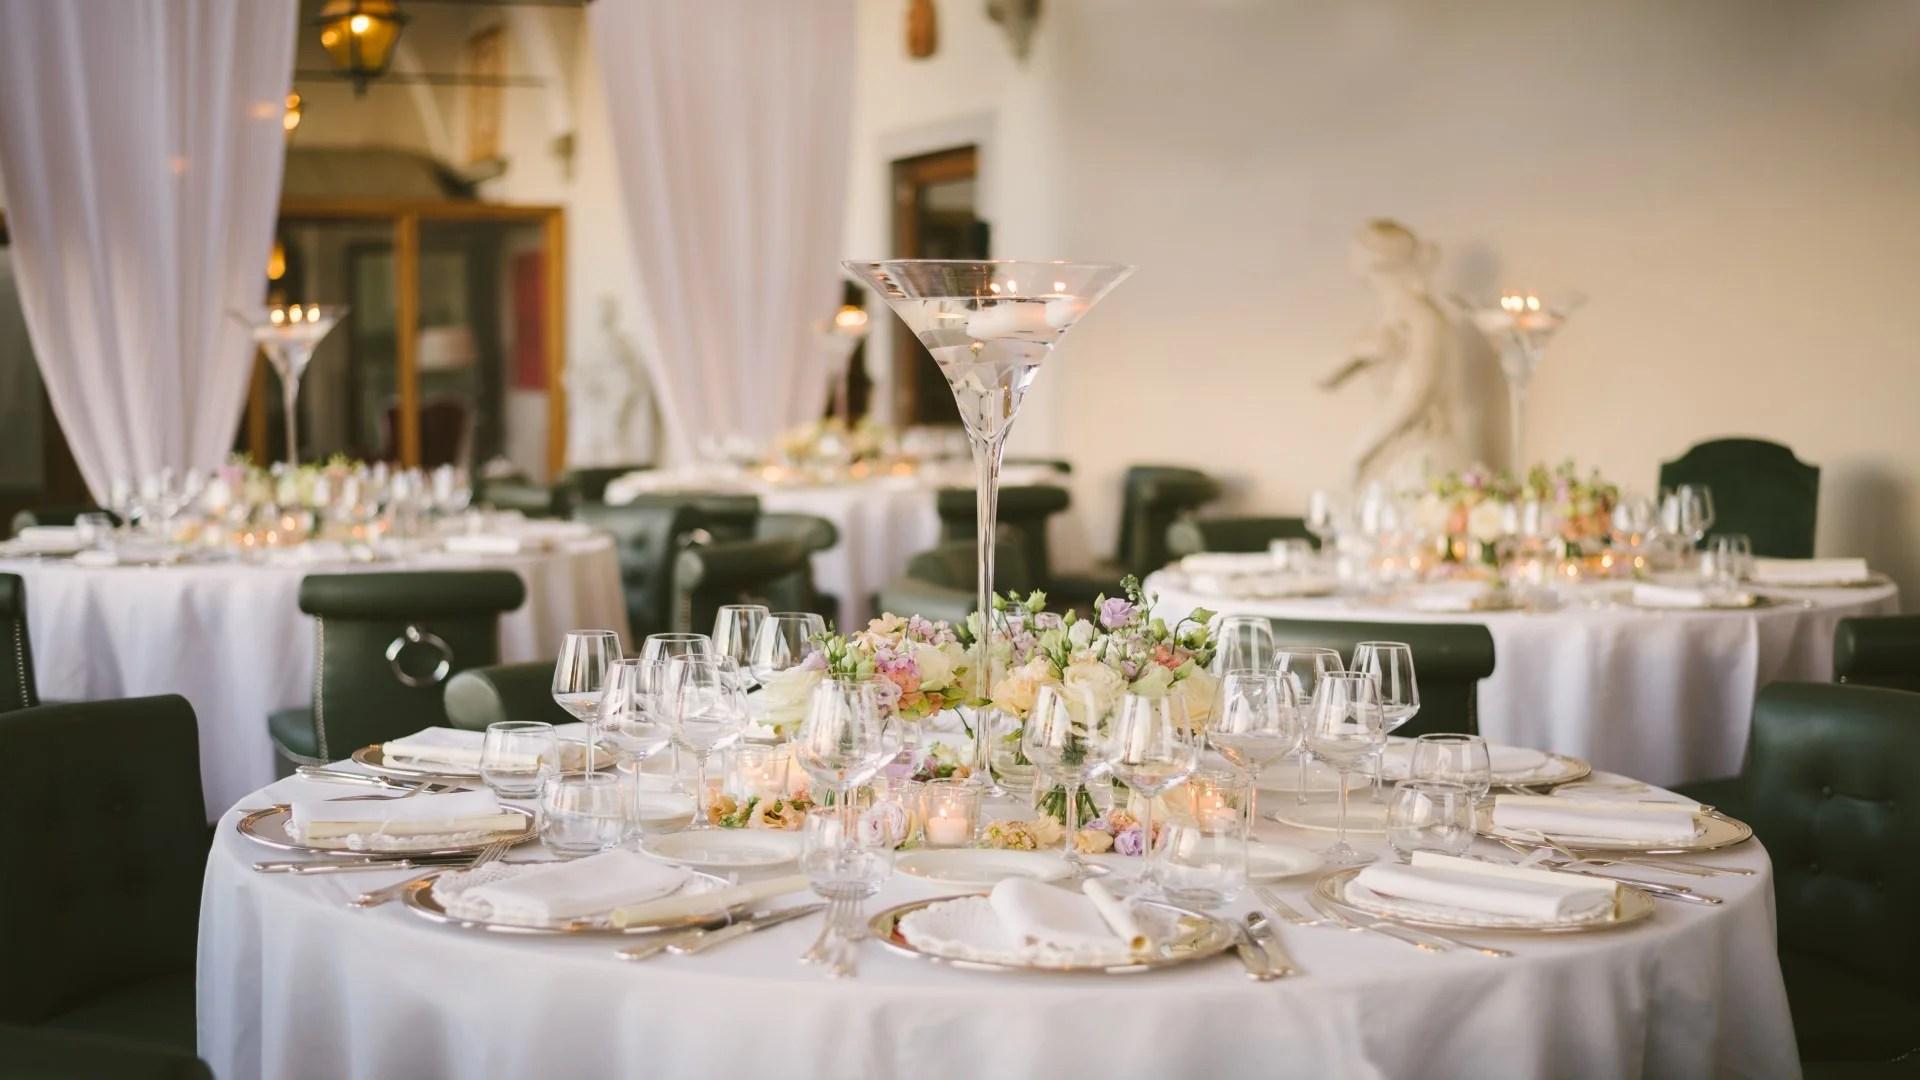 Cerimonie - Villa Tolomei Hotel & Resort 5 stelle